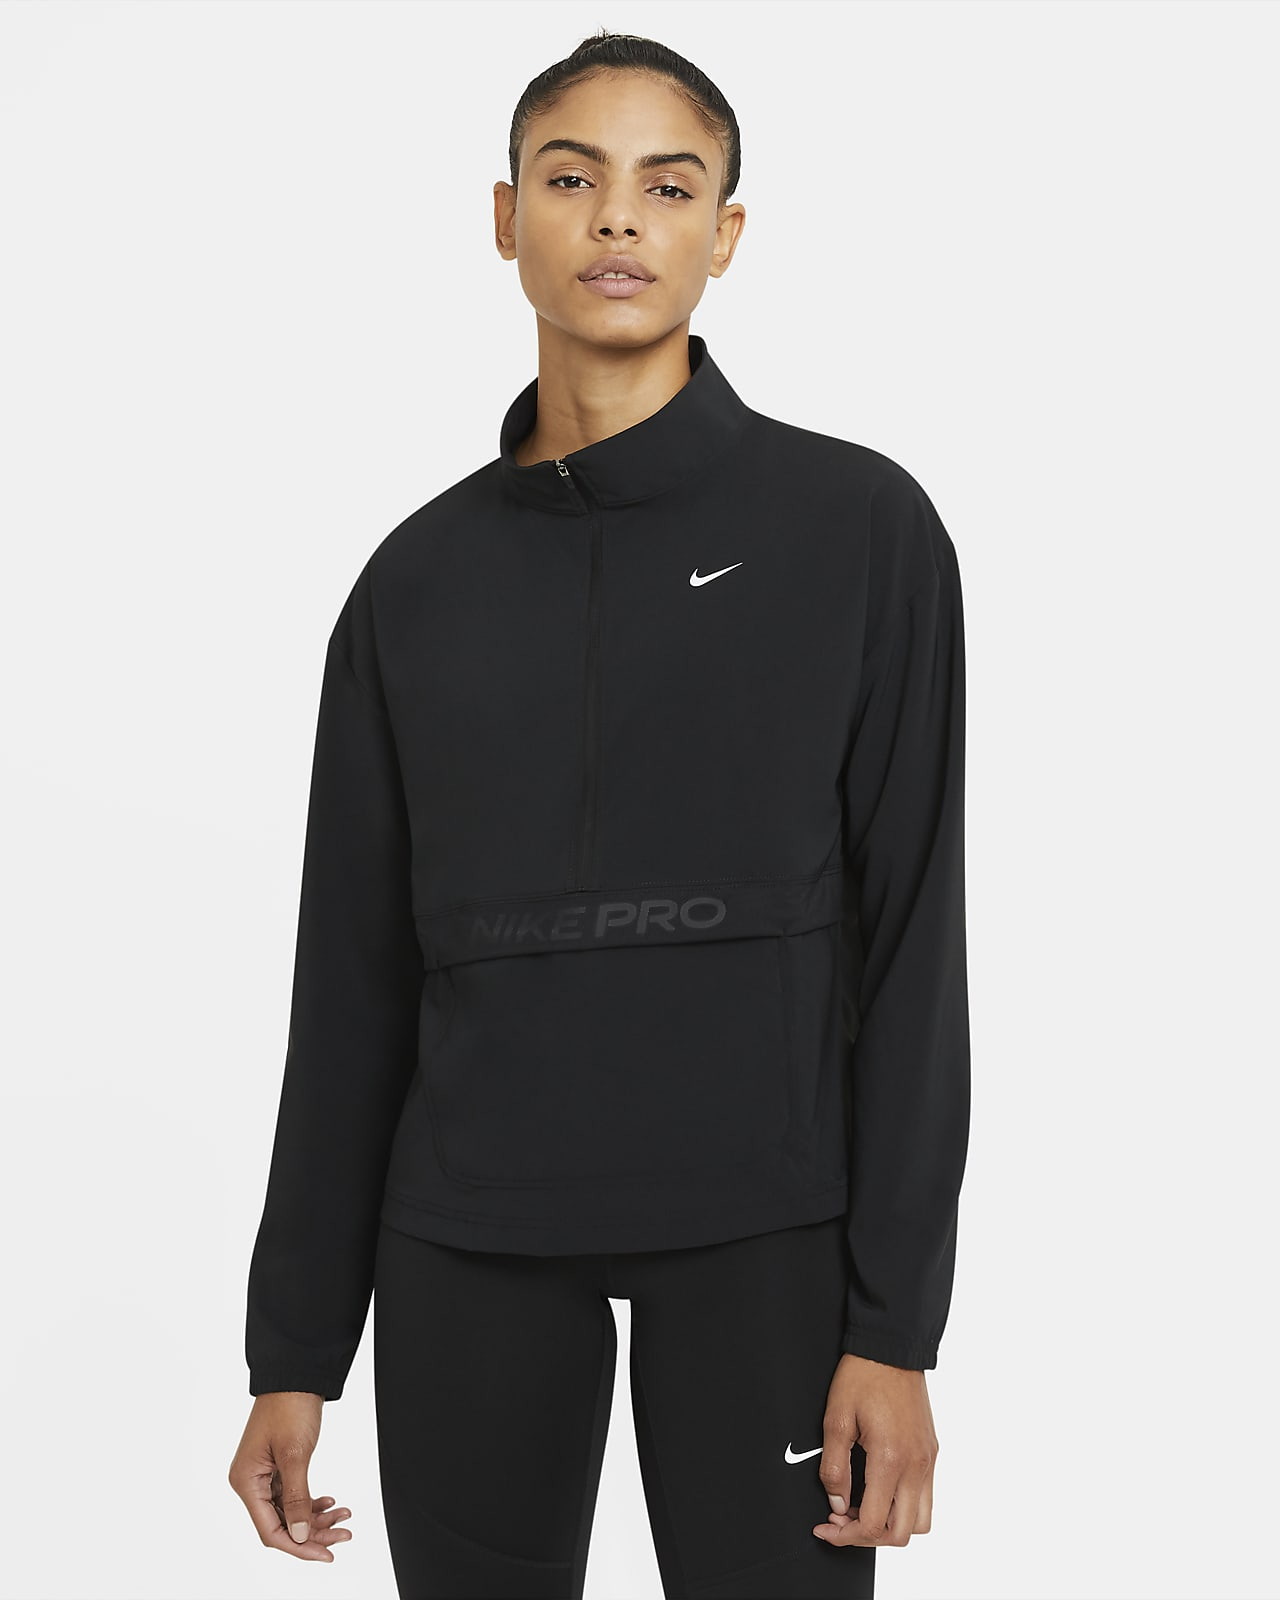 Nike Pro verstaubares, gewebtes Cover-Up für Damen